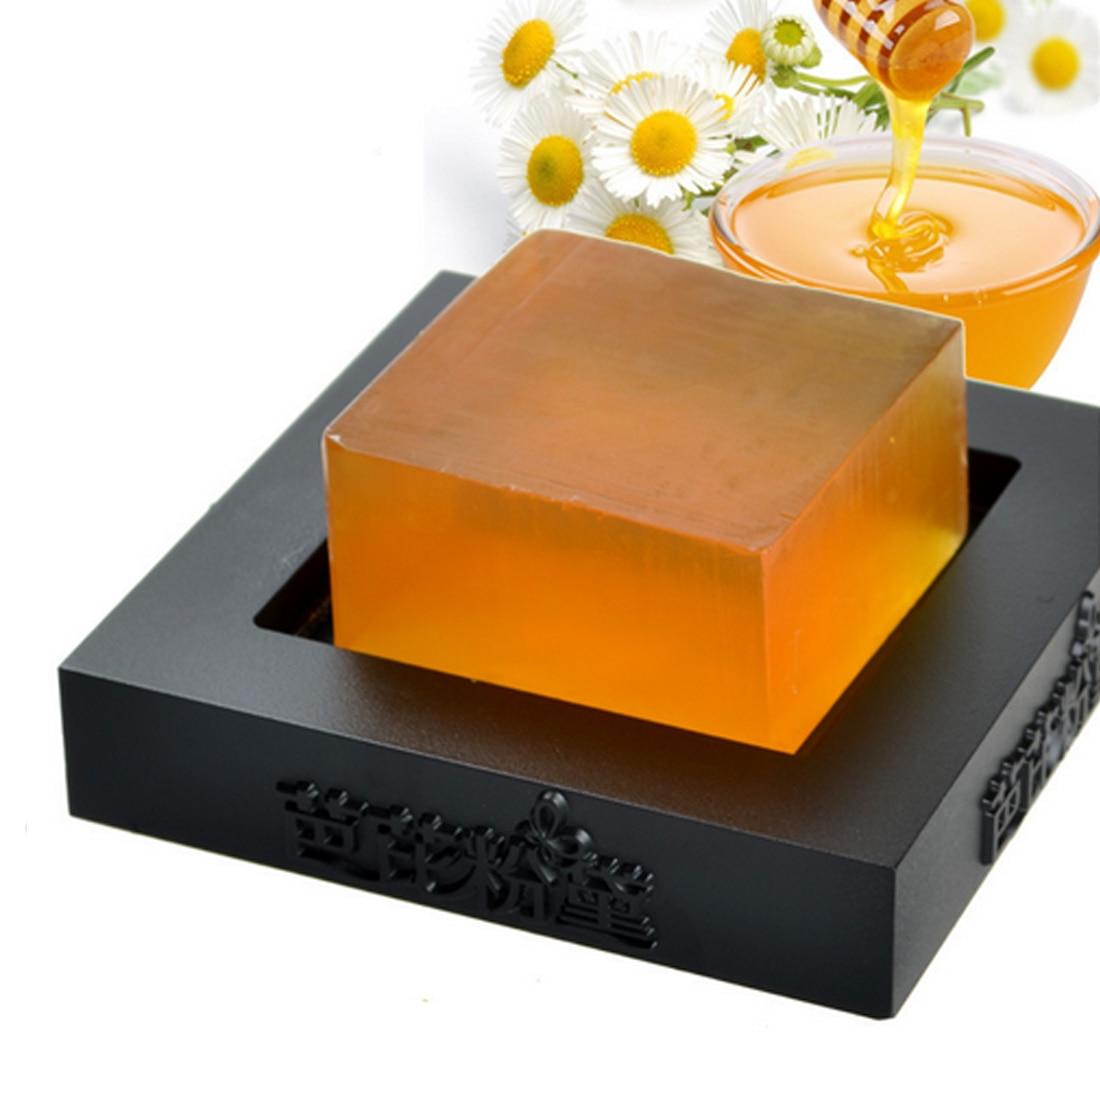 Good Quality 100% HandMade Whitening Peeling Glutathione Arbutin Honey Kojic Acid Soap 100g